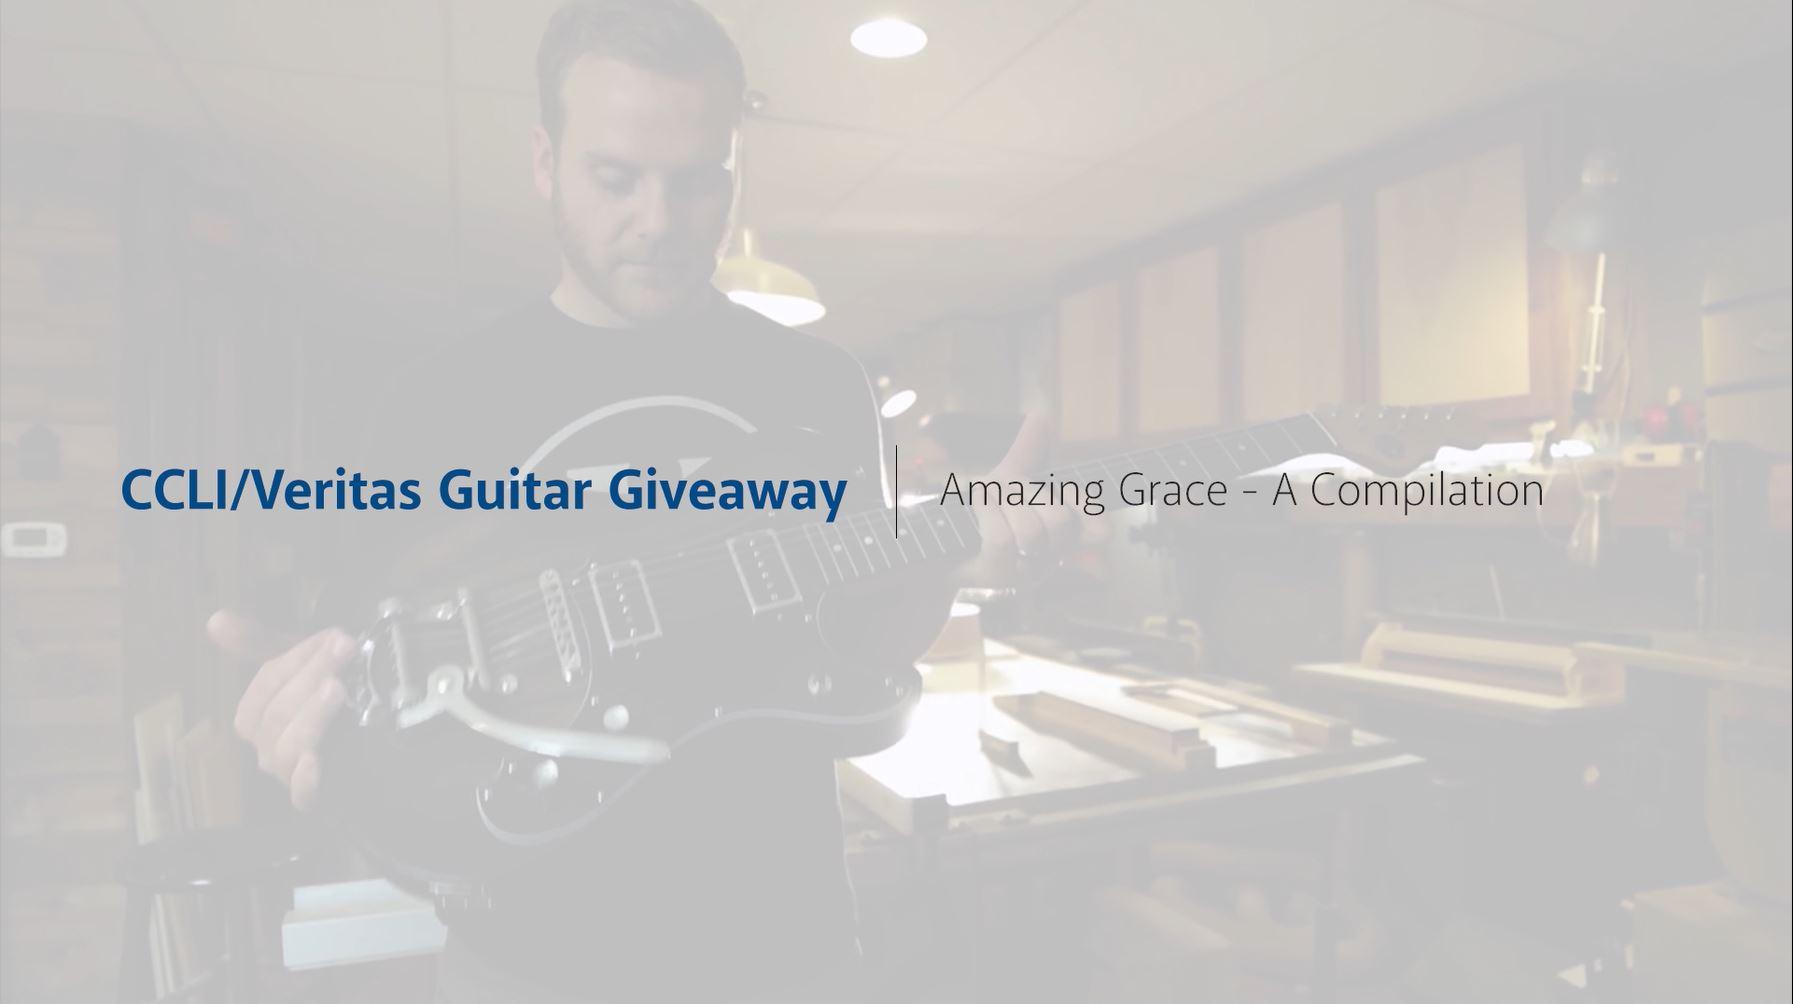 Amazing Grace – A Compilation